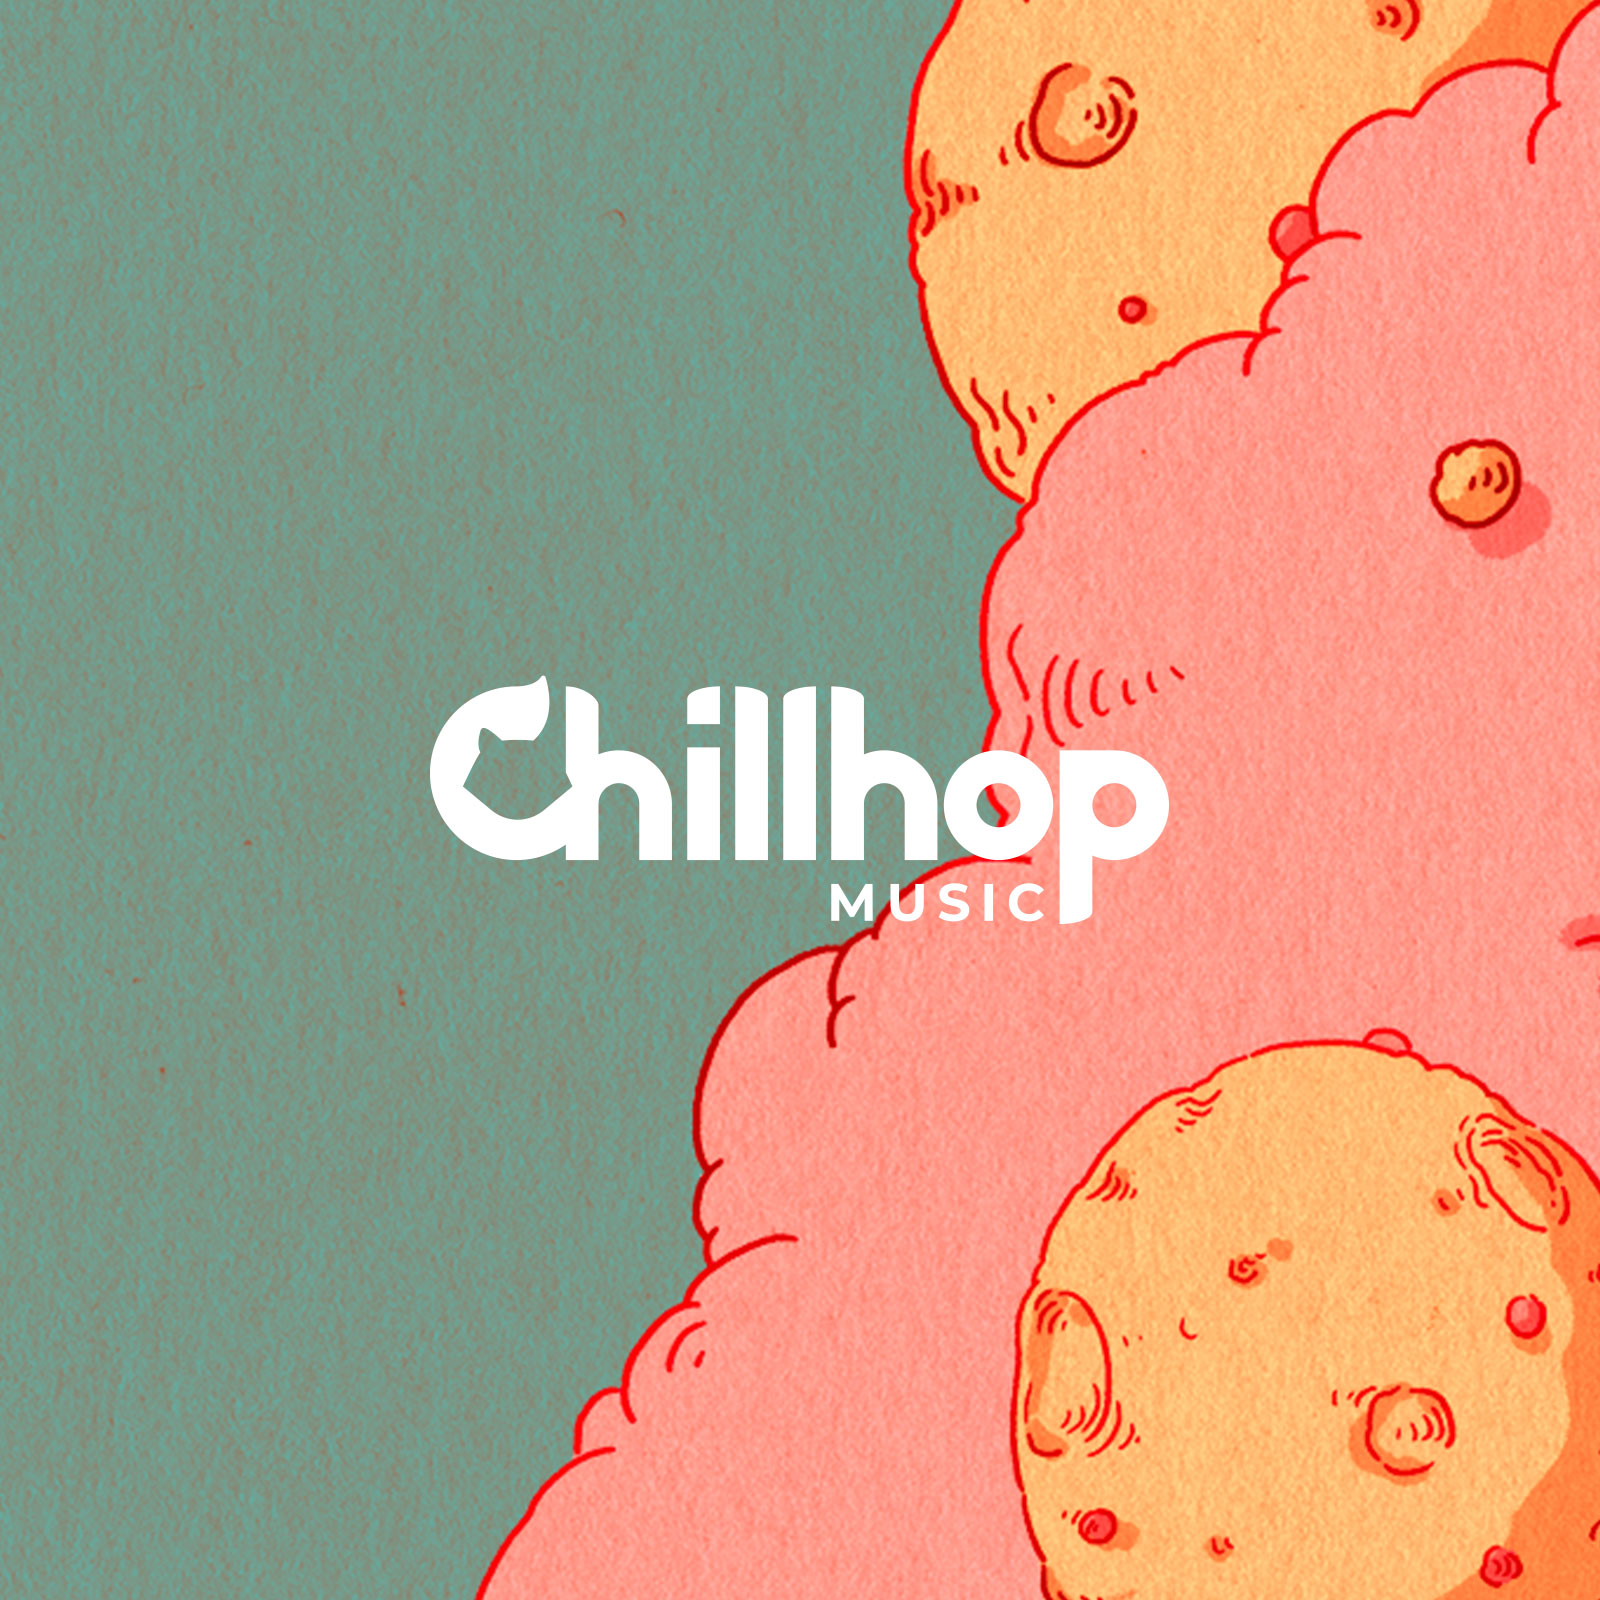 Chillhop Music.